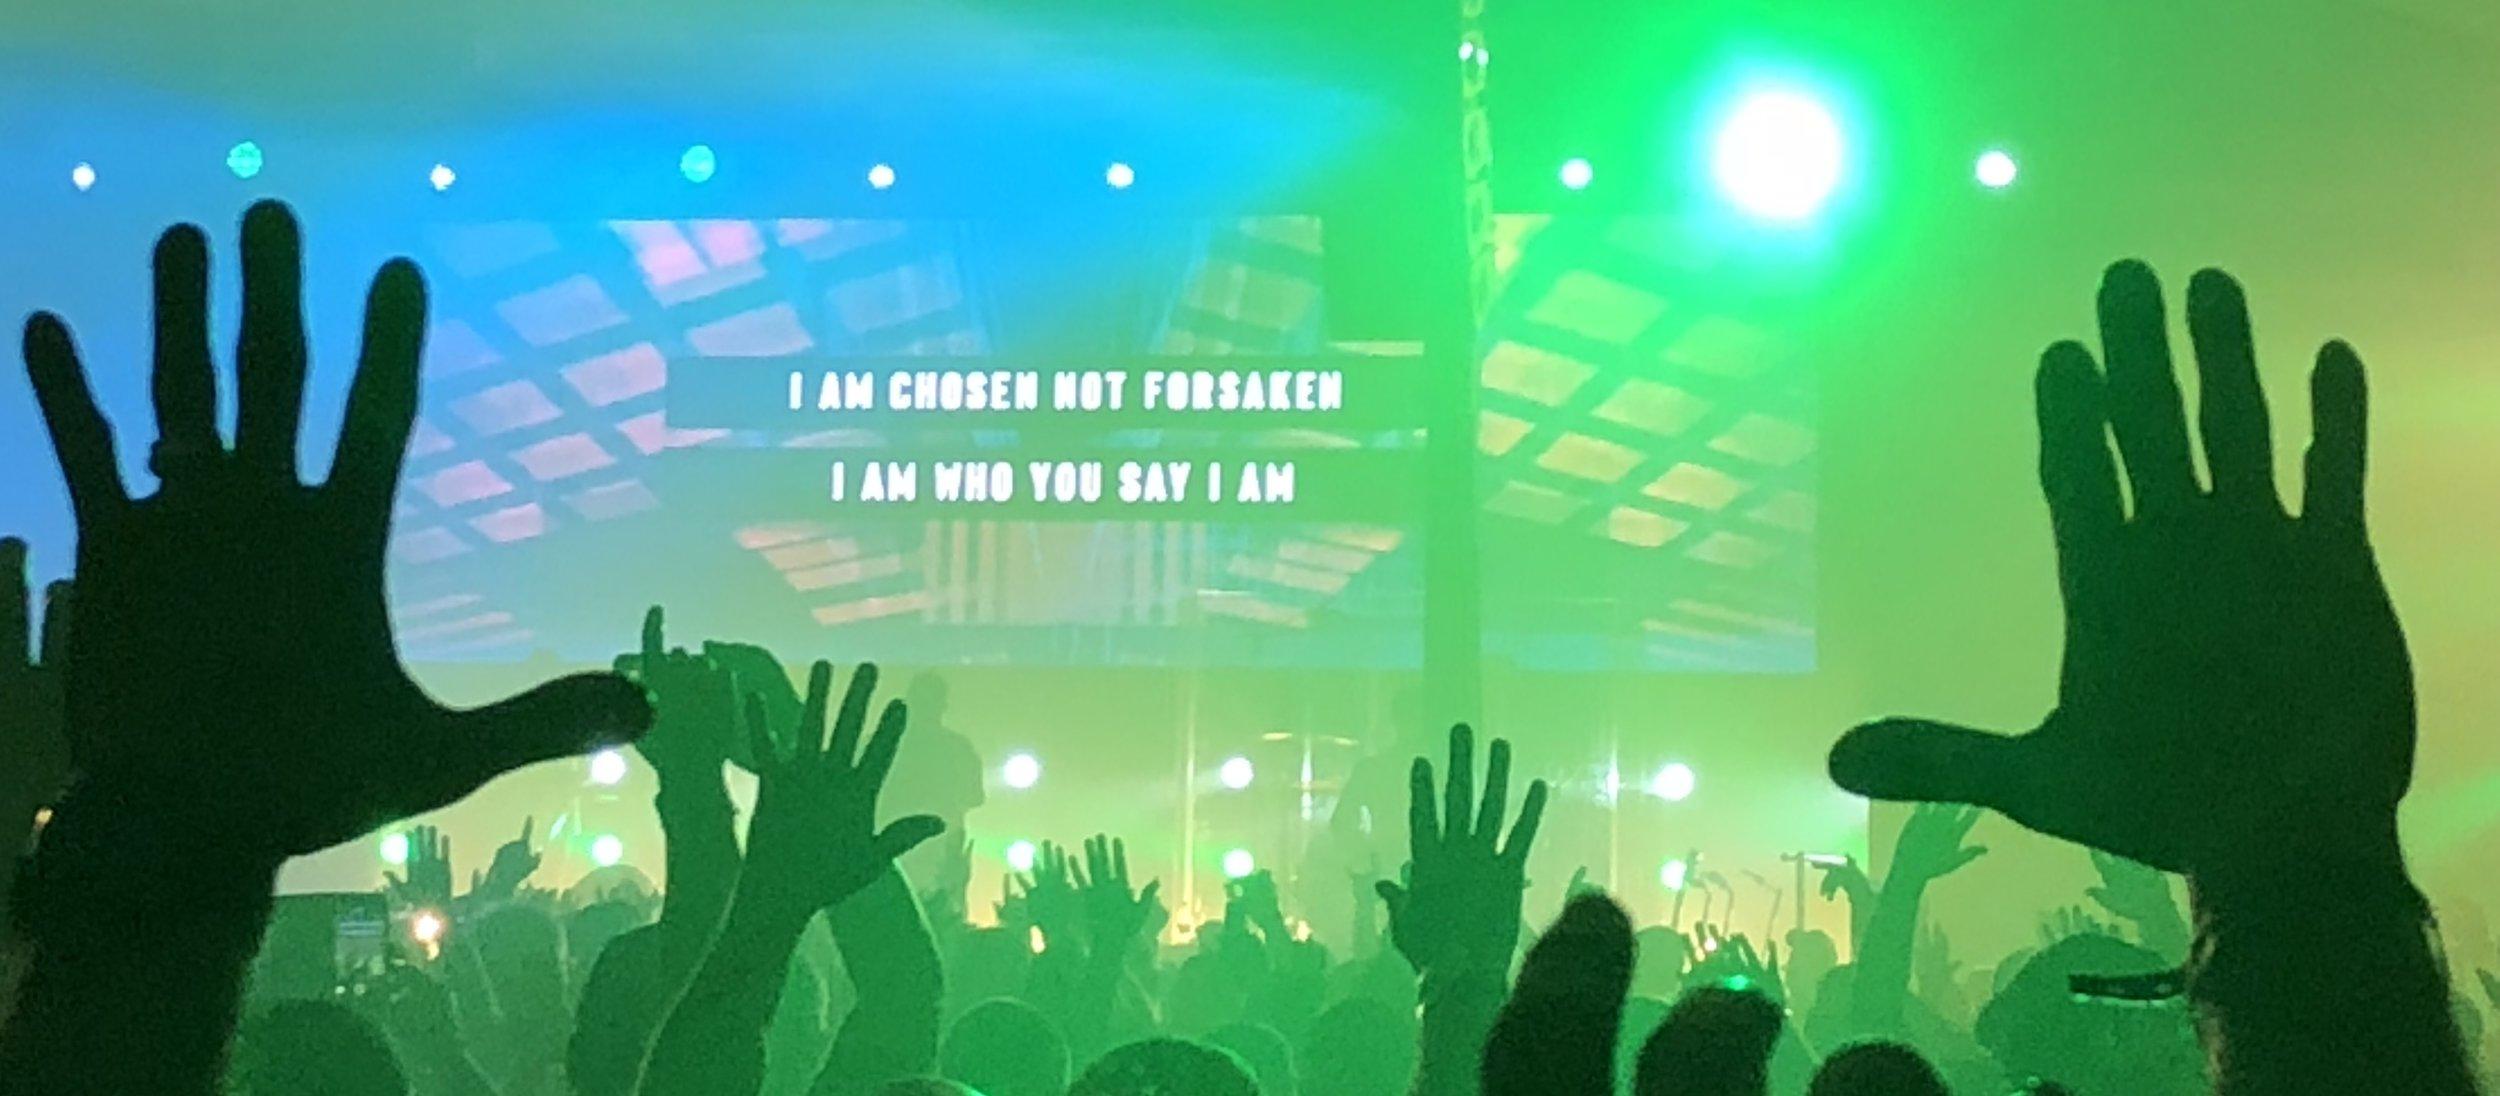 I am chosen, not forsaken. I am who You say I am